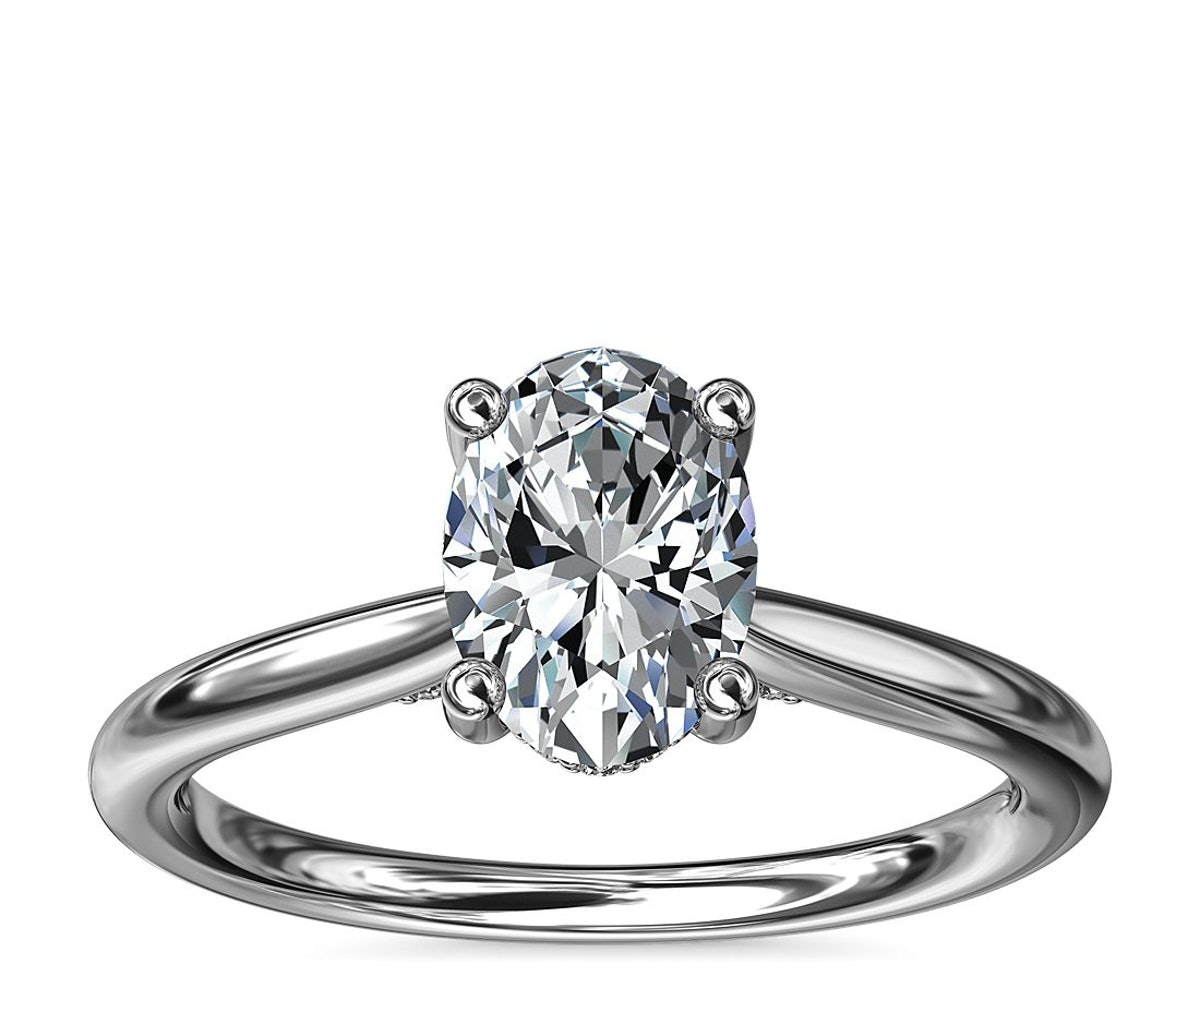 Petite Hidden Halo Solitaire Plus Diamond Engagement Ring